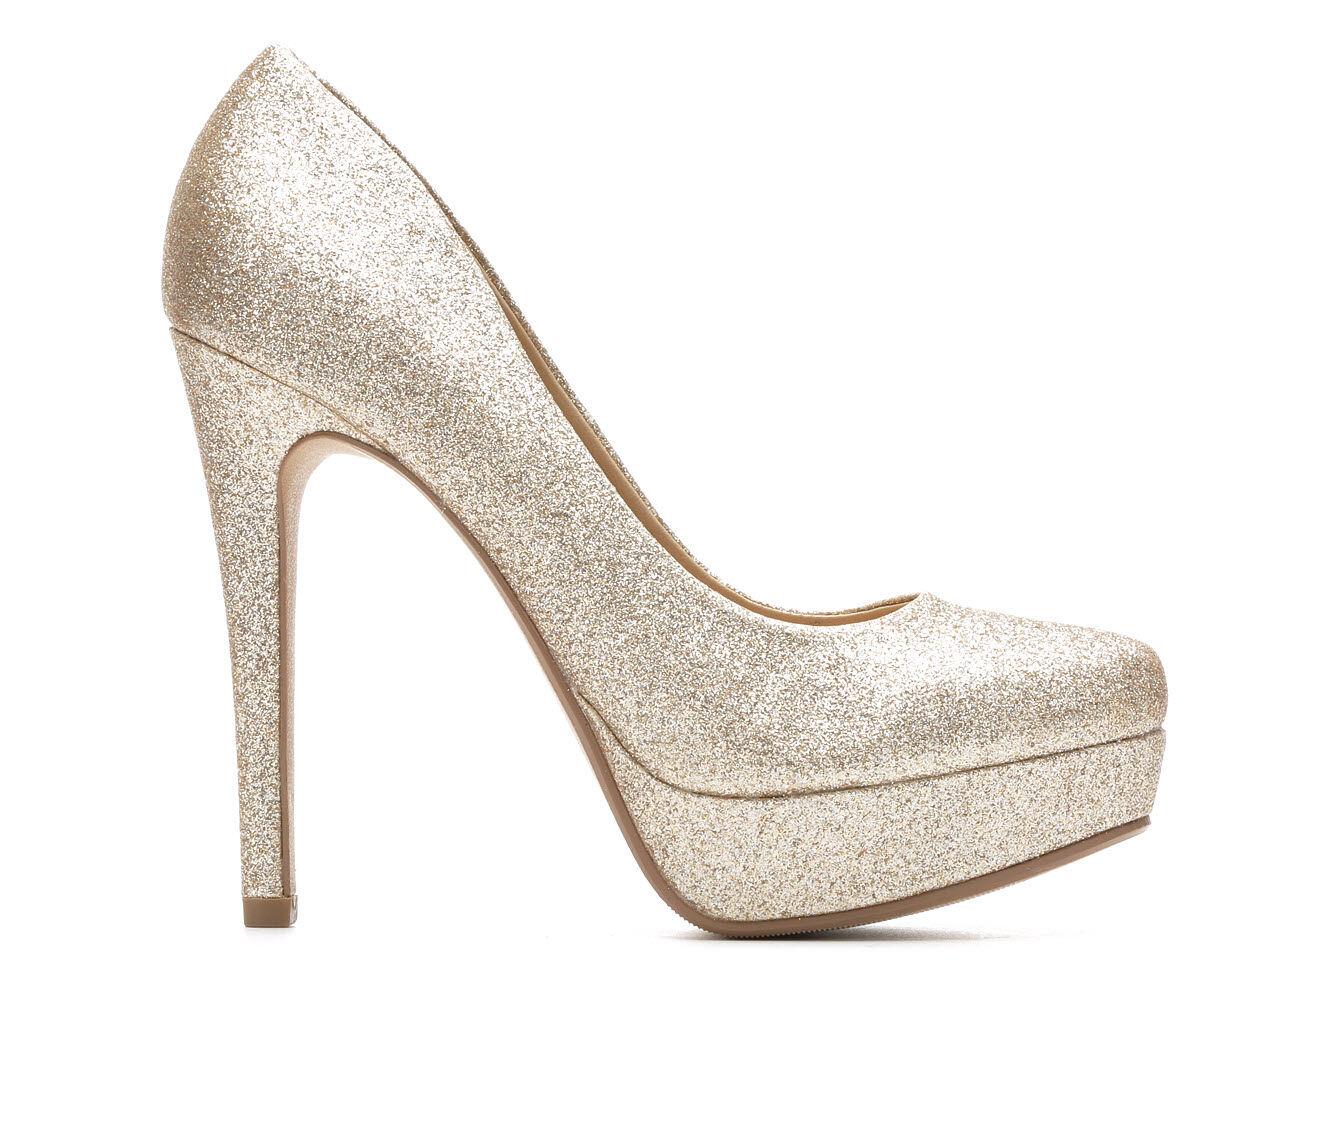 Womens Delicious Jinni Platform UltraHigh Heels